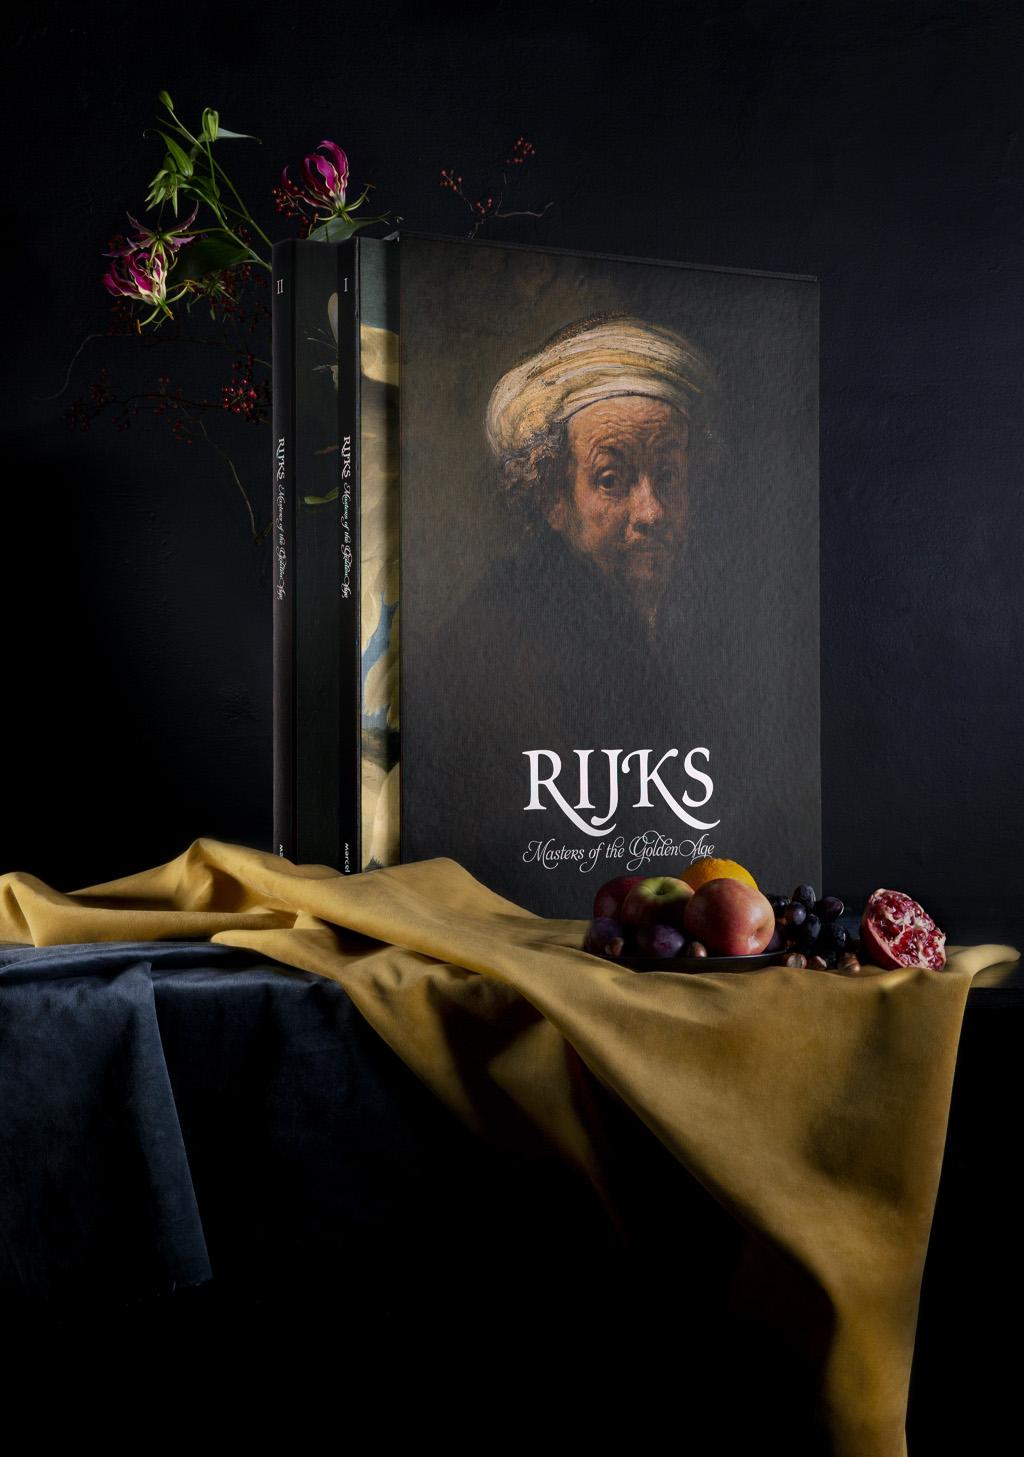 MW_Rijks_special_edition_1024_12